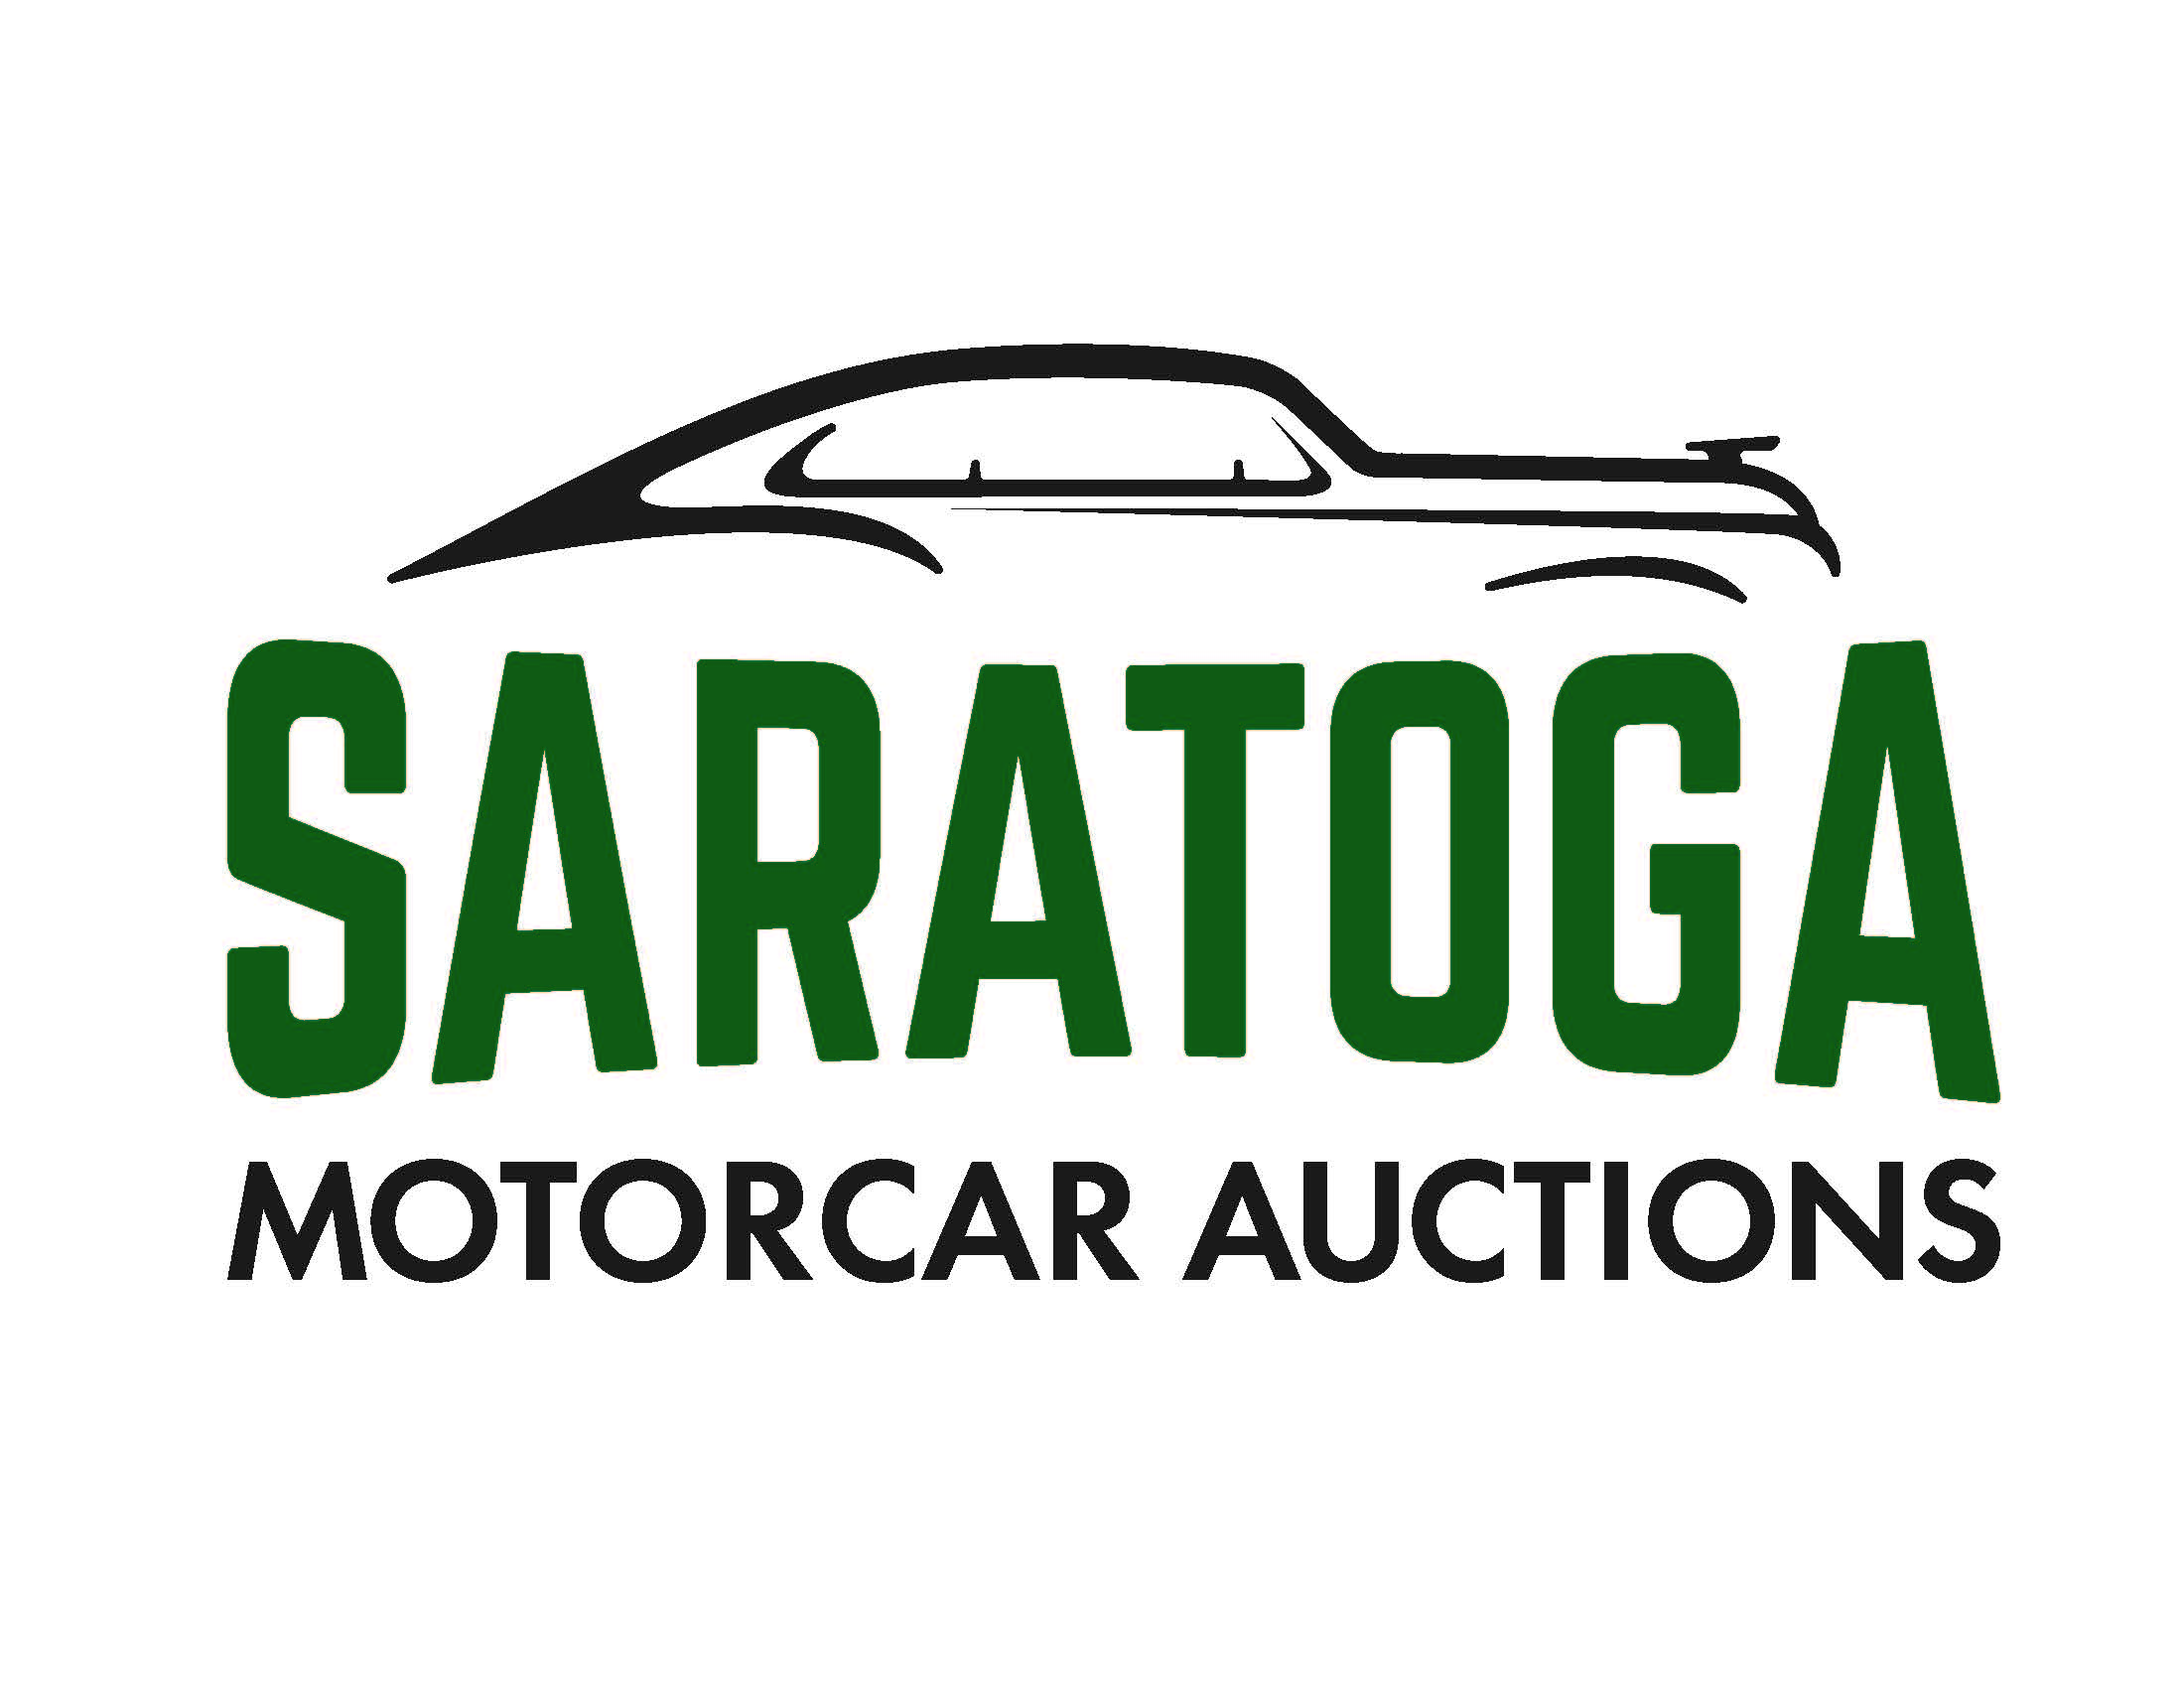 Saratoga Motorcar Auction